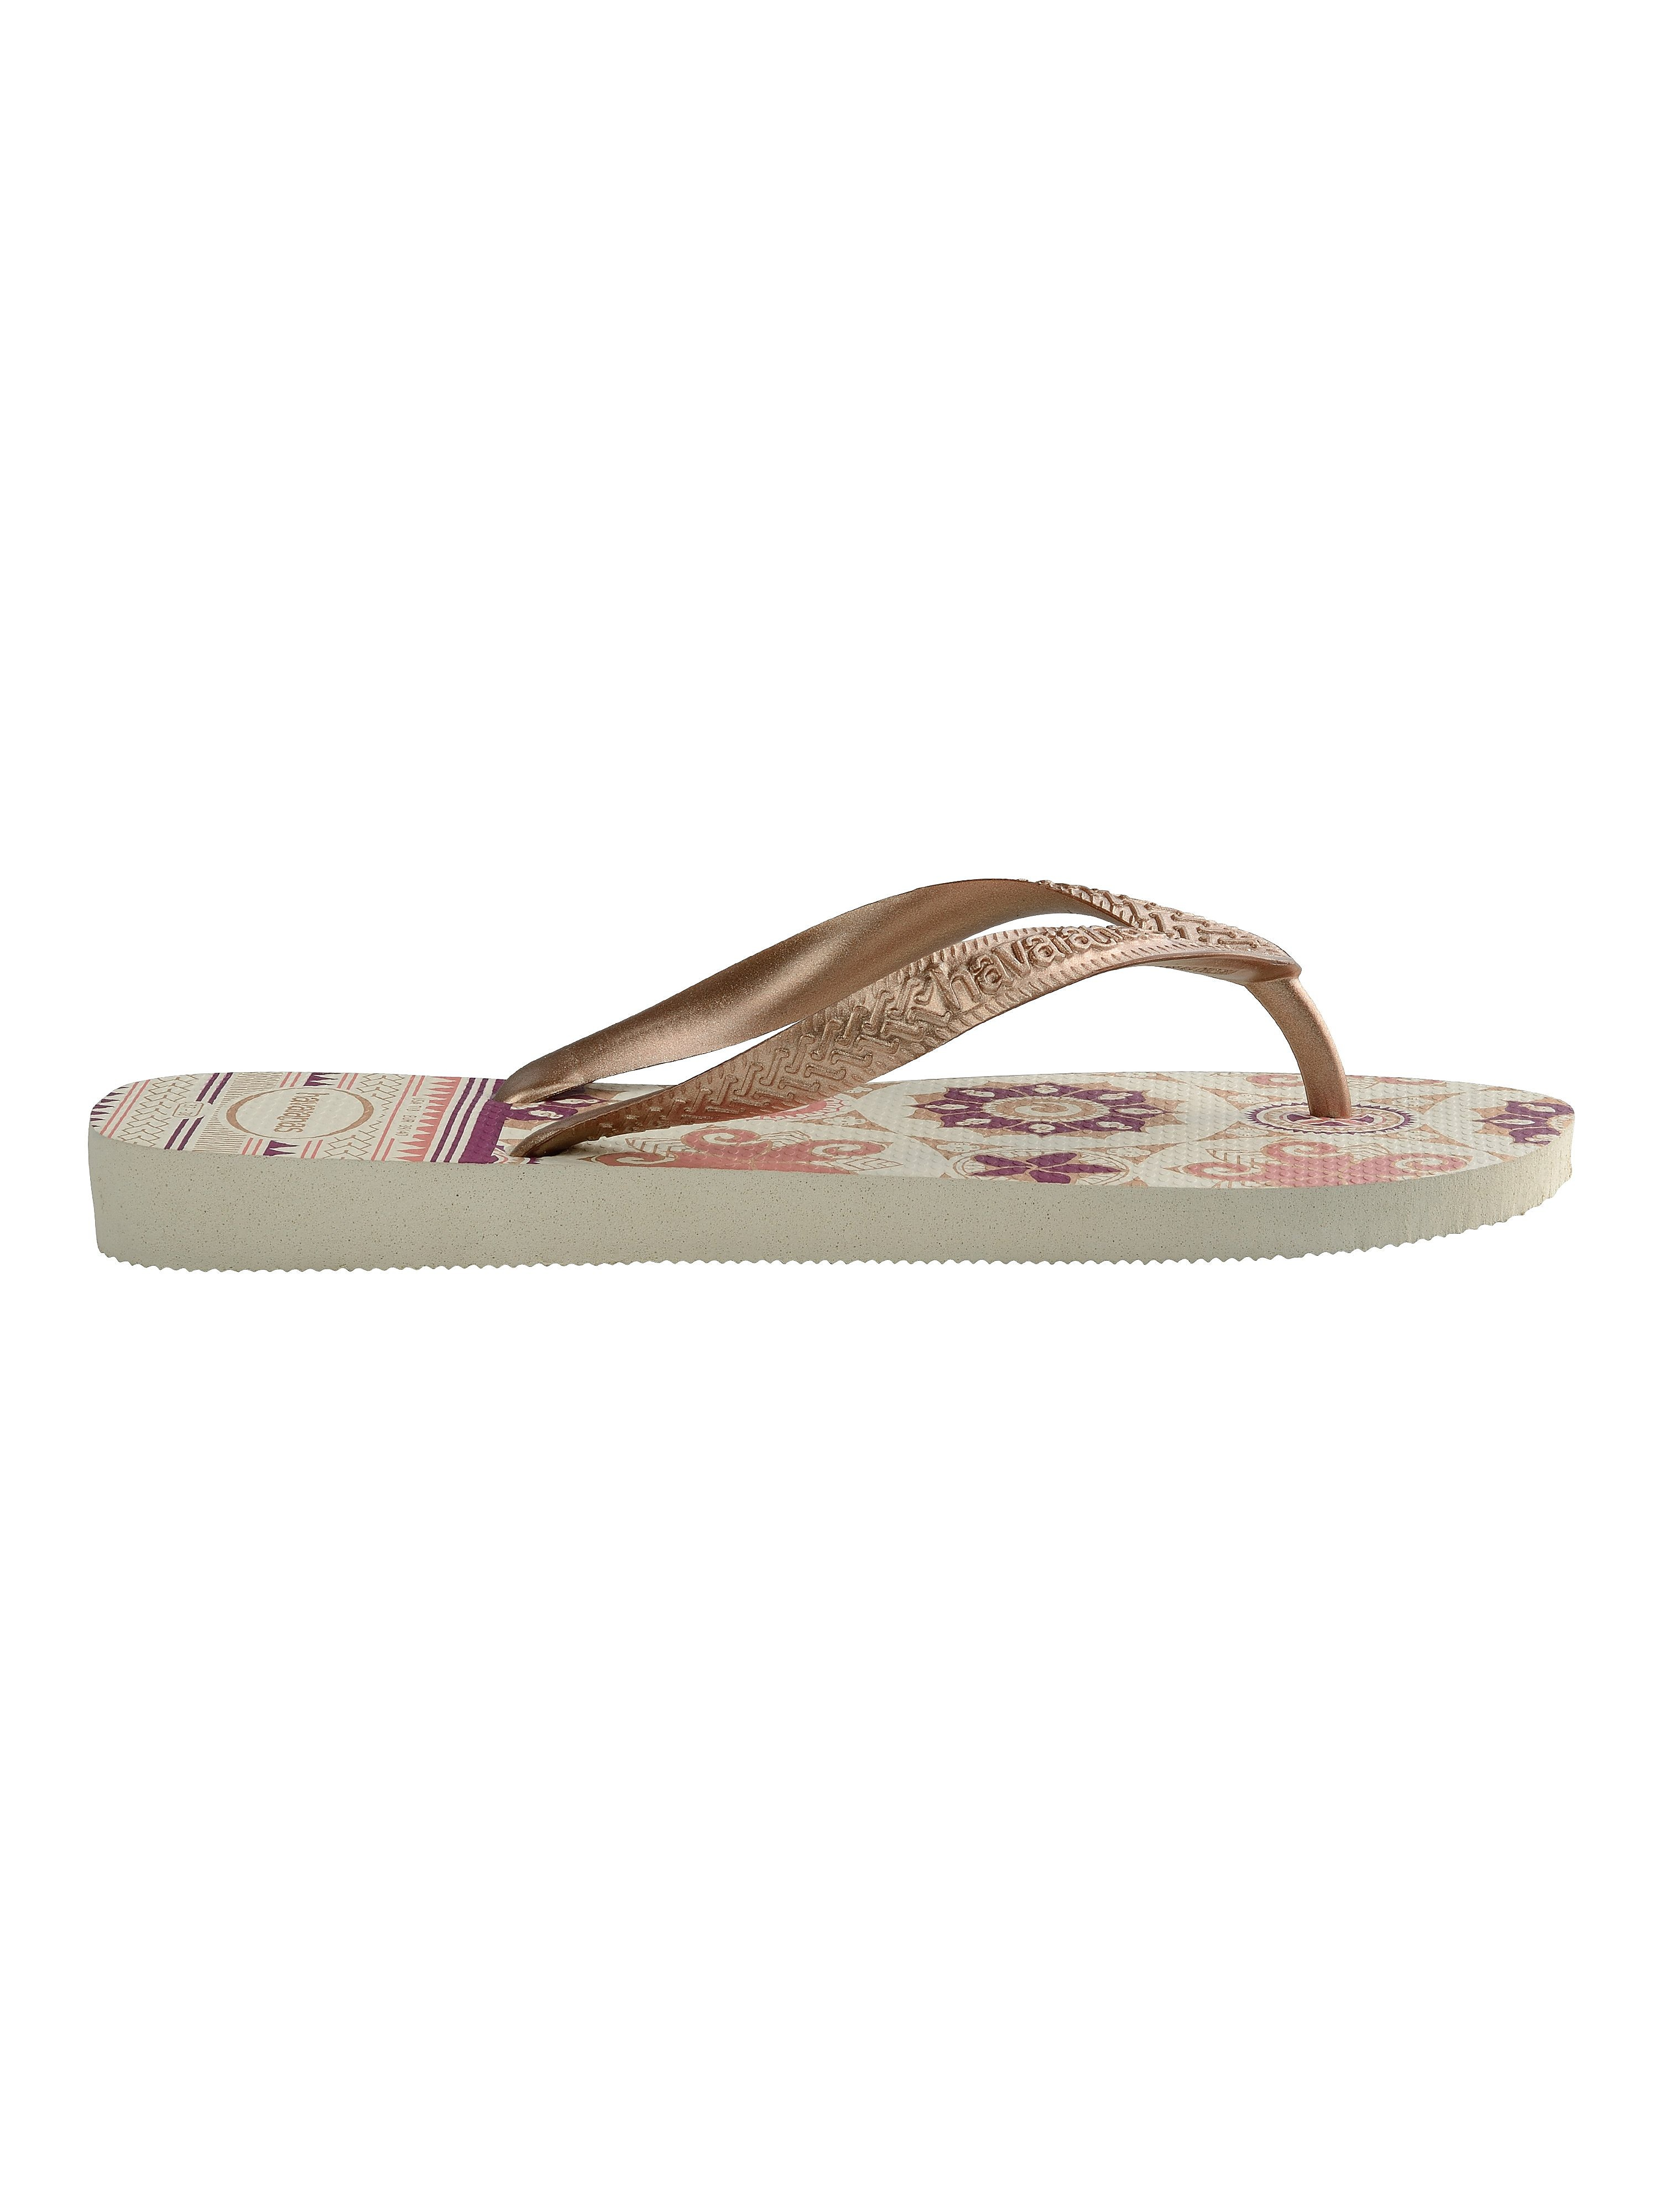 Havaianas Women's Spring Flip Flop - White/Rose Gold